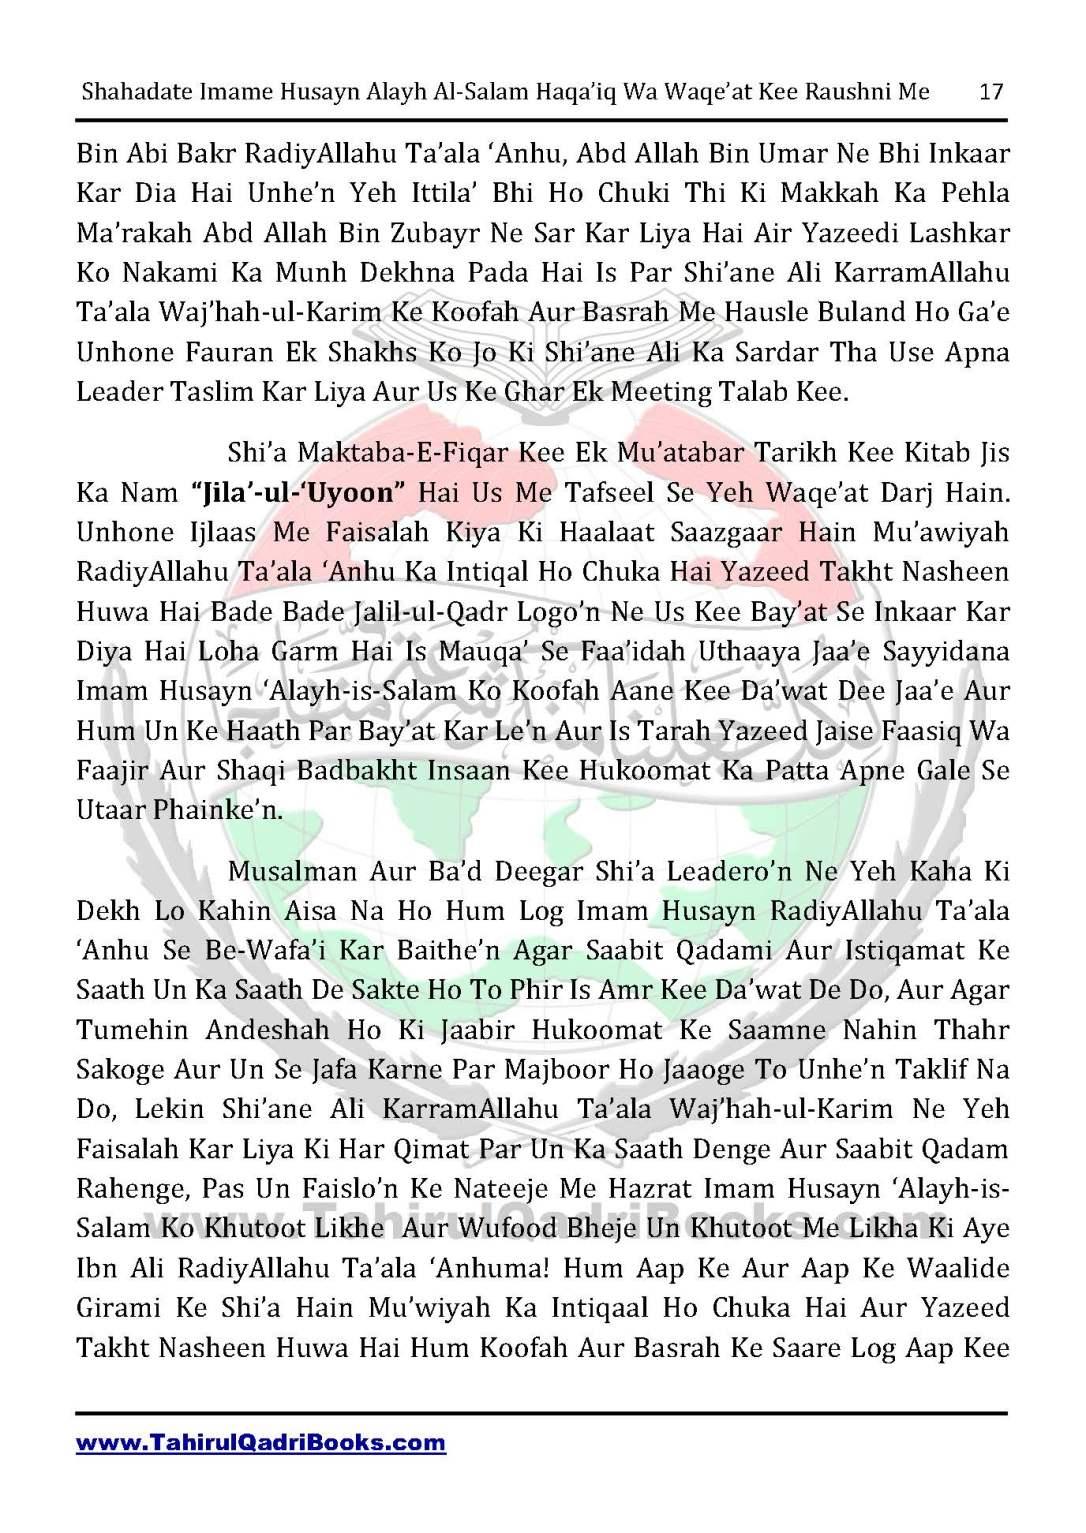 shahadate-imame-husayn-alayh-is-salam-haqaiq-wa-waqe_at-kee-raushni-me-in-roman-urdu-unlocked_Page_17